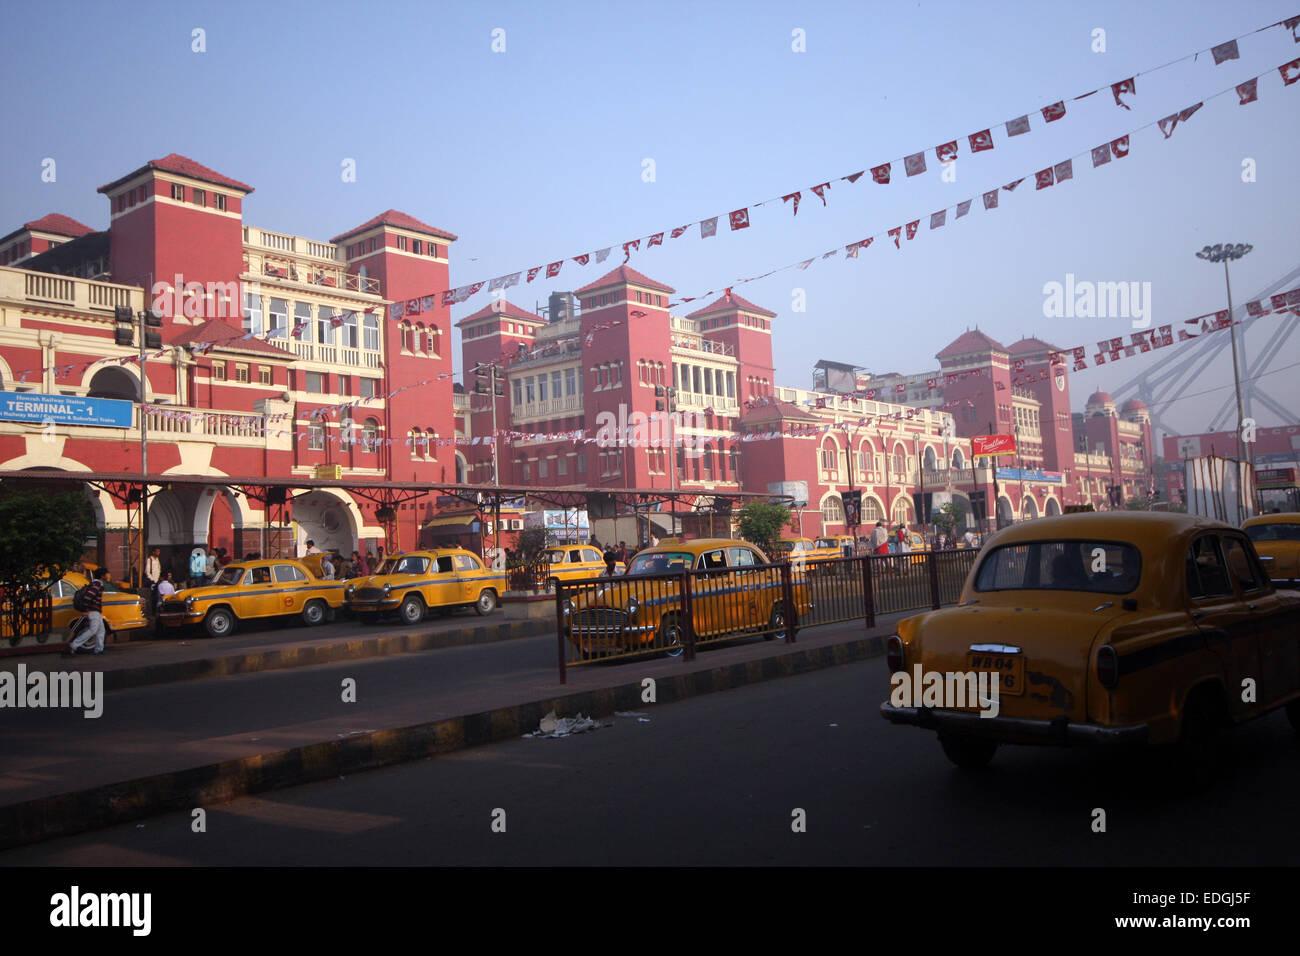 Howrah Station, Kolkata (Calcutta), India - Stock Image